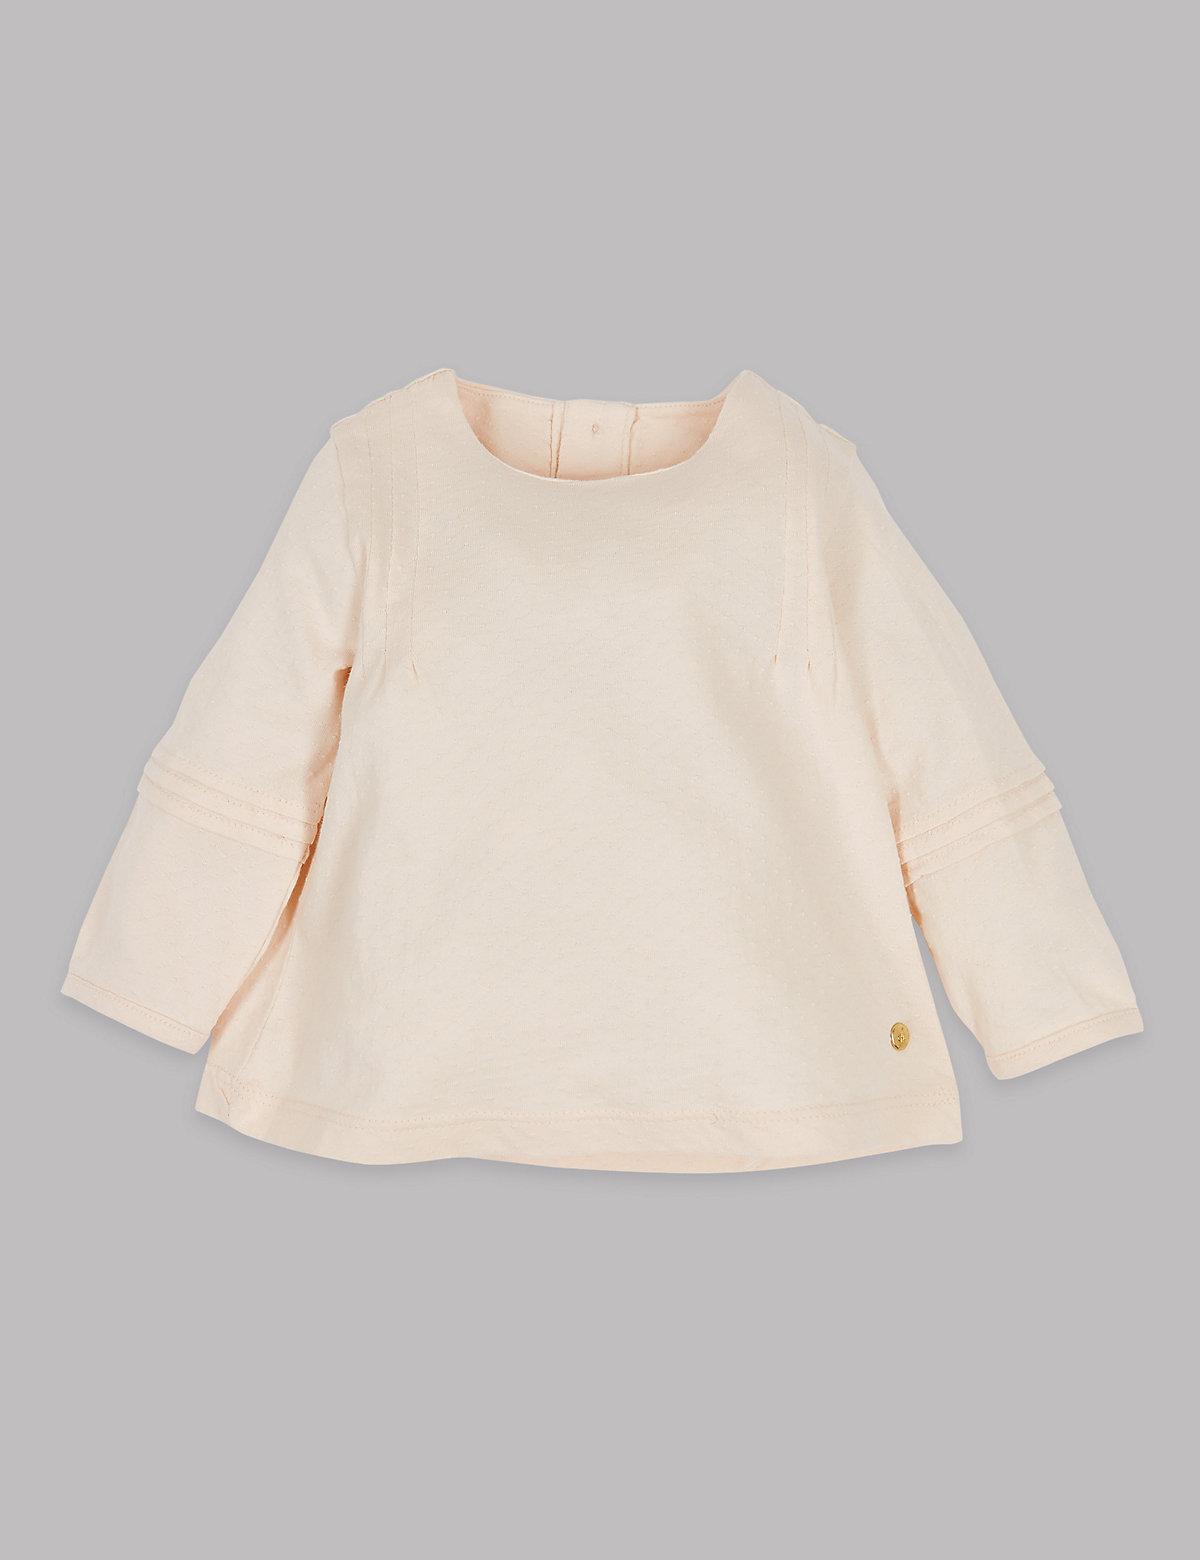 Autograph Pure Cotton Textured Jersey Top